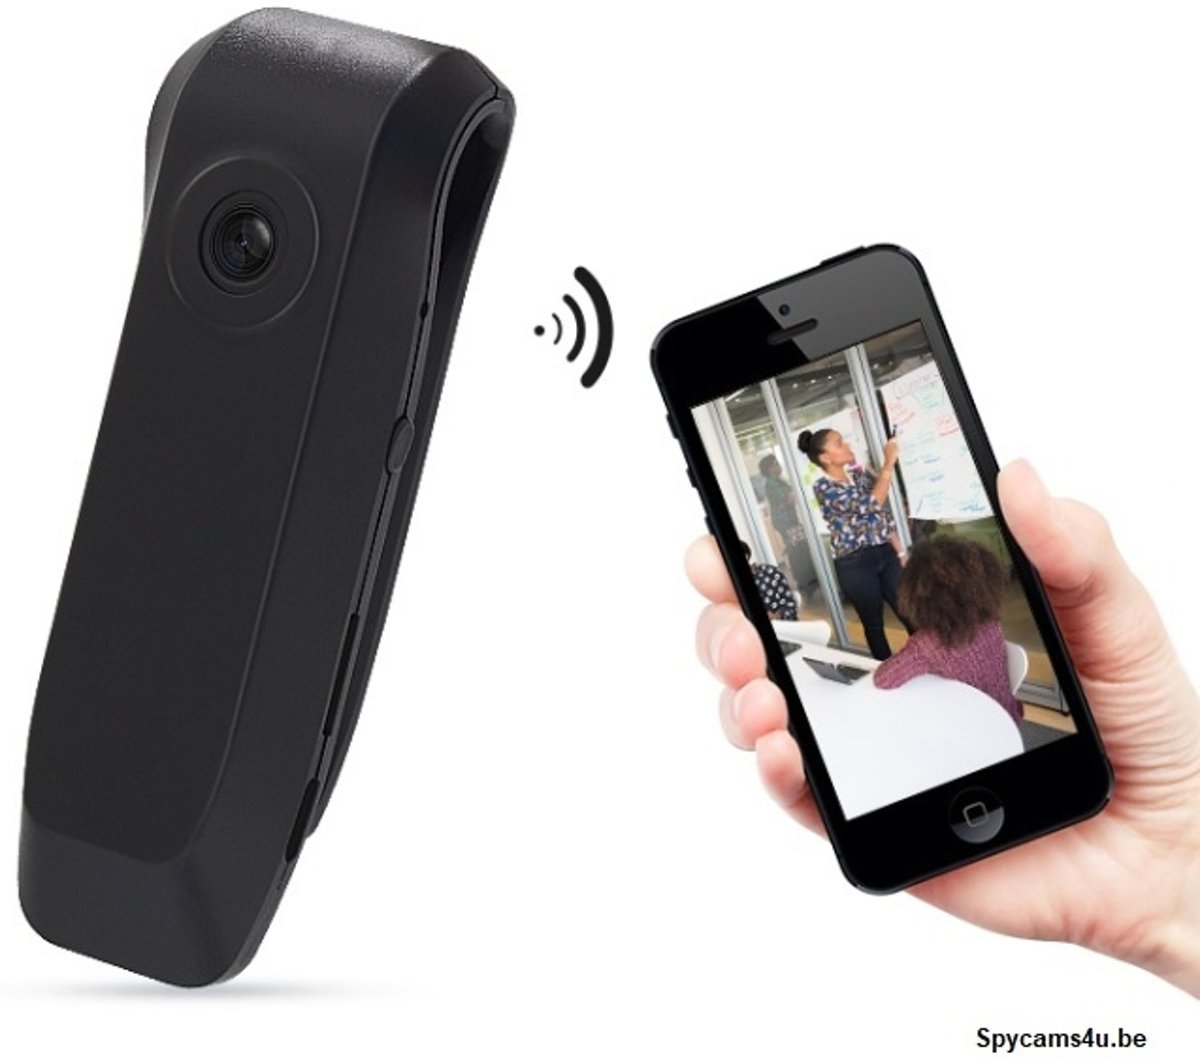 Knoop camera - meeting camera - verborgen camera - spy camera